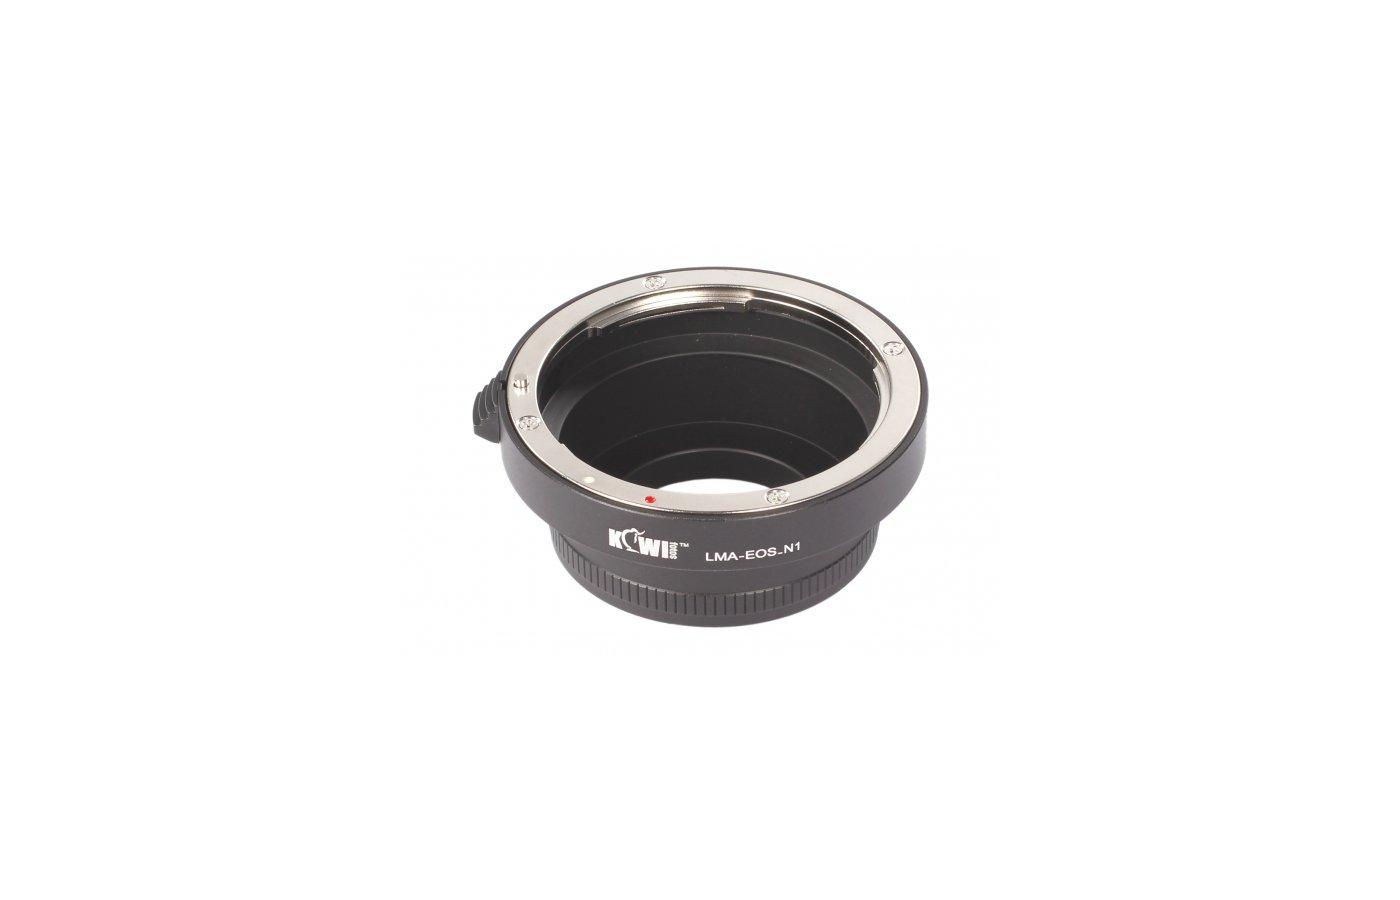 JJC KIWIFOTOS LMA-EOS-N1 (Canon EF- Nikon 1) Переходное кольцо